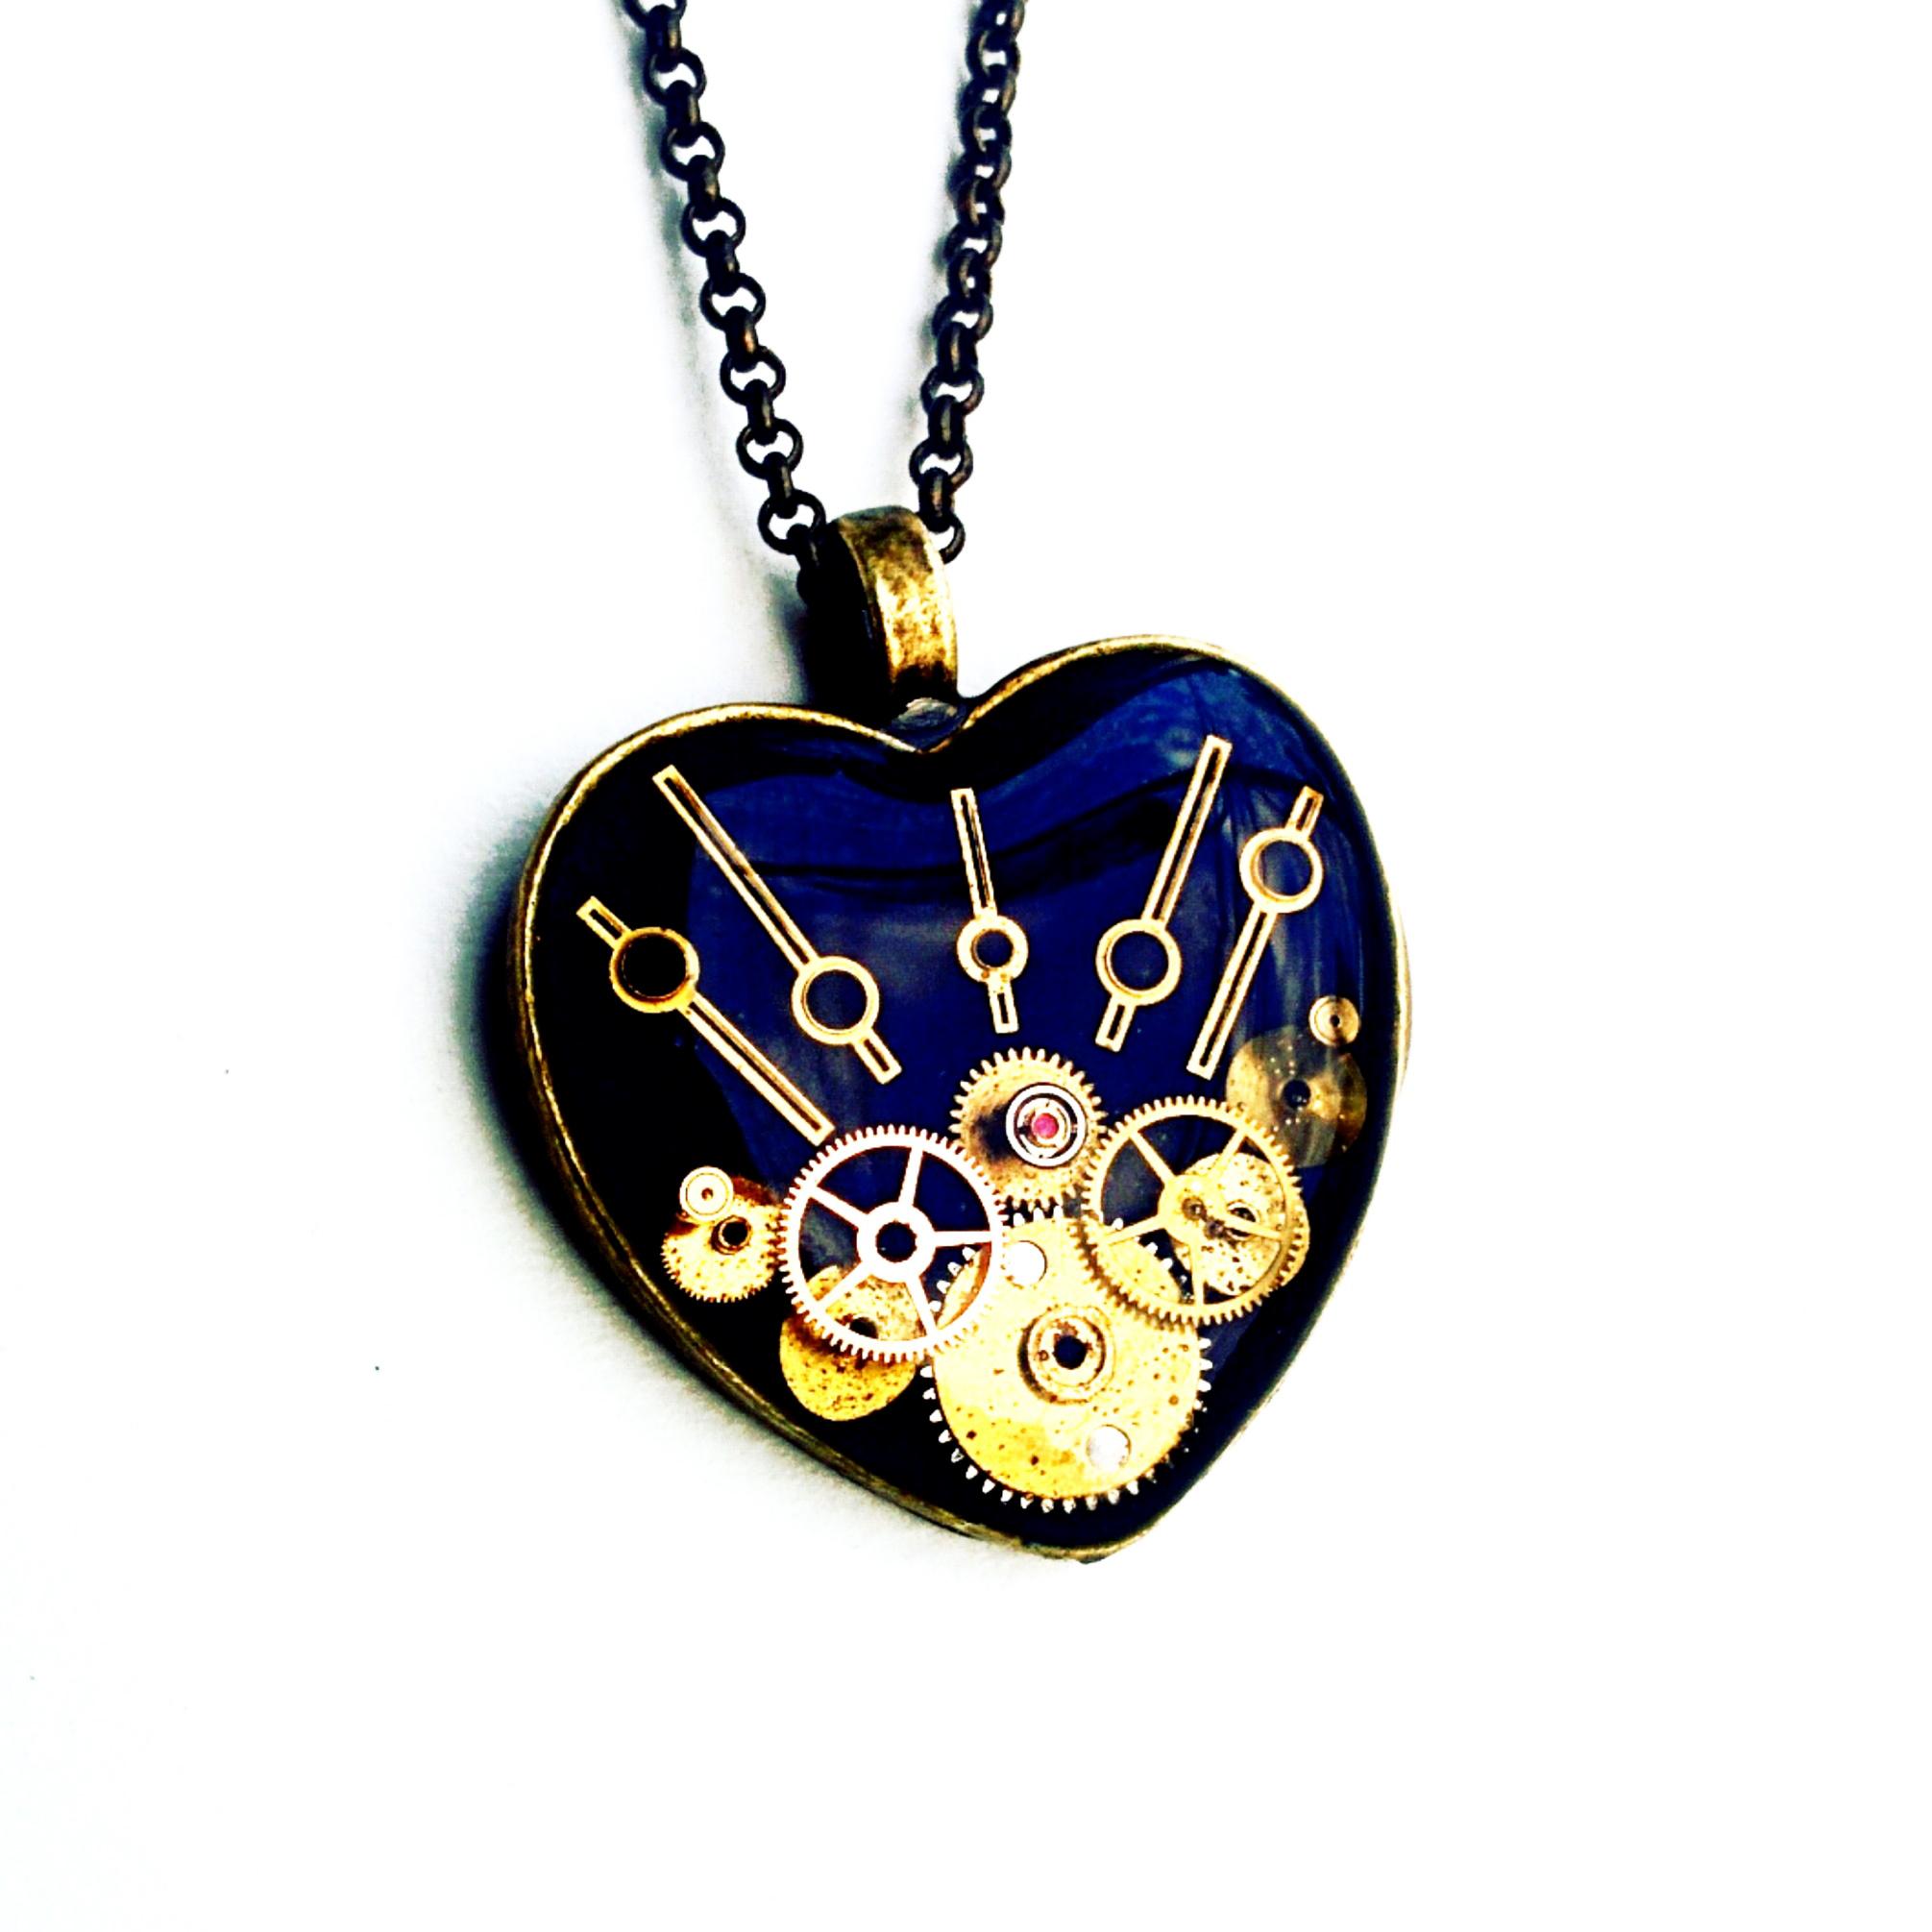 Aminda-Wood-Mechanical-Heart-WatchParts.jpg